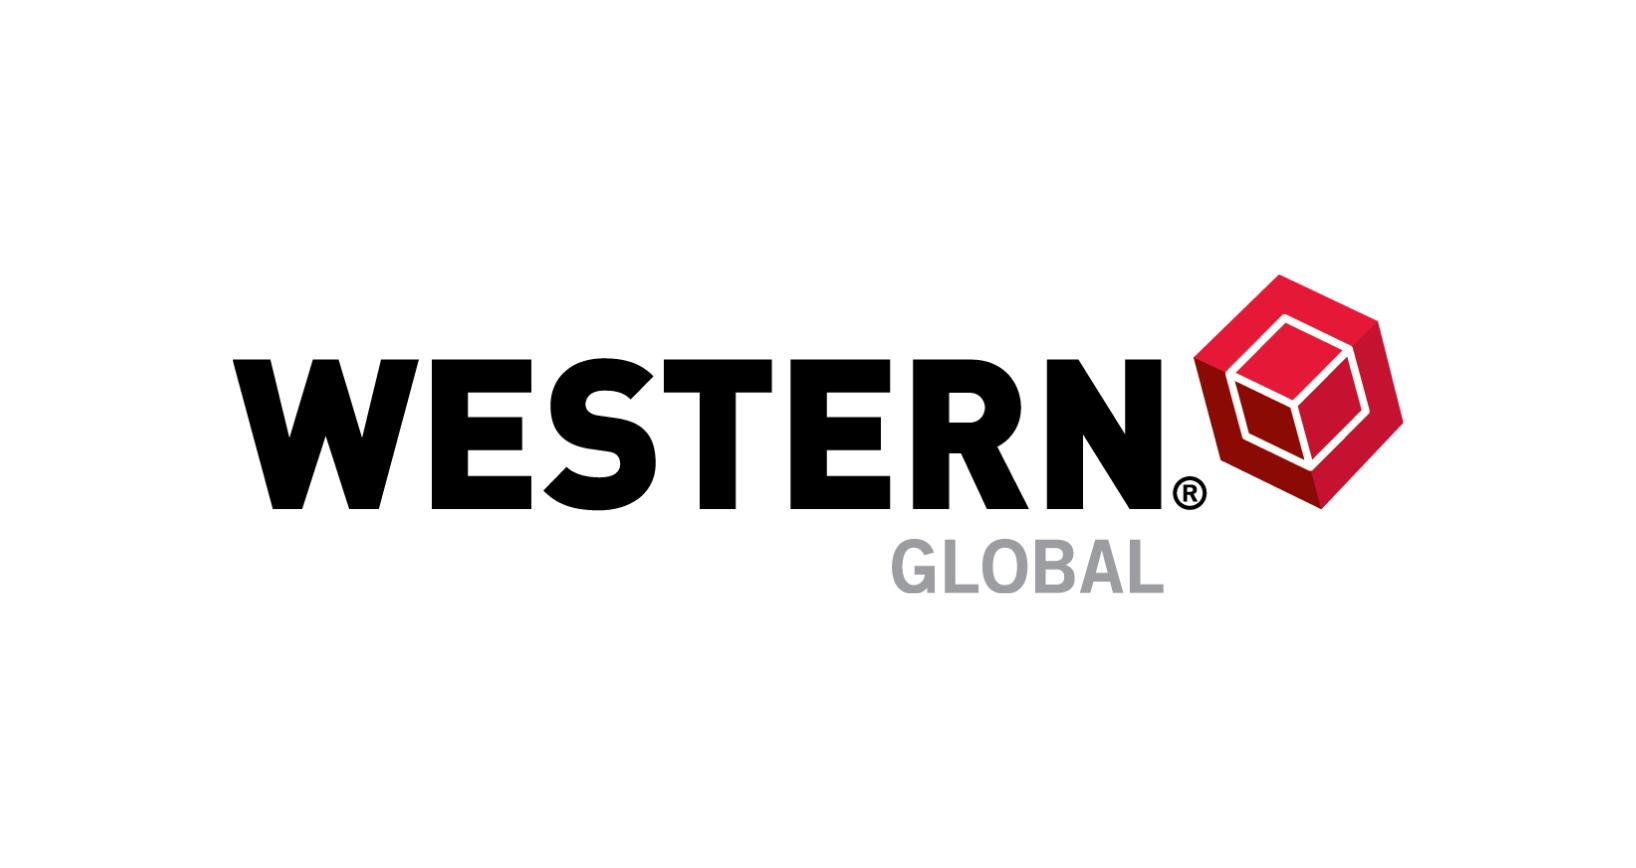 Western Globally